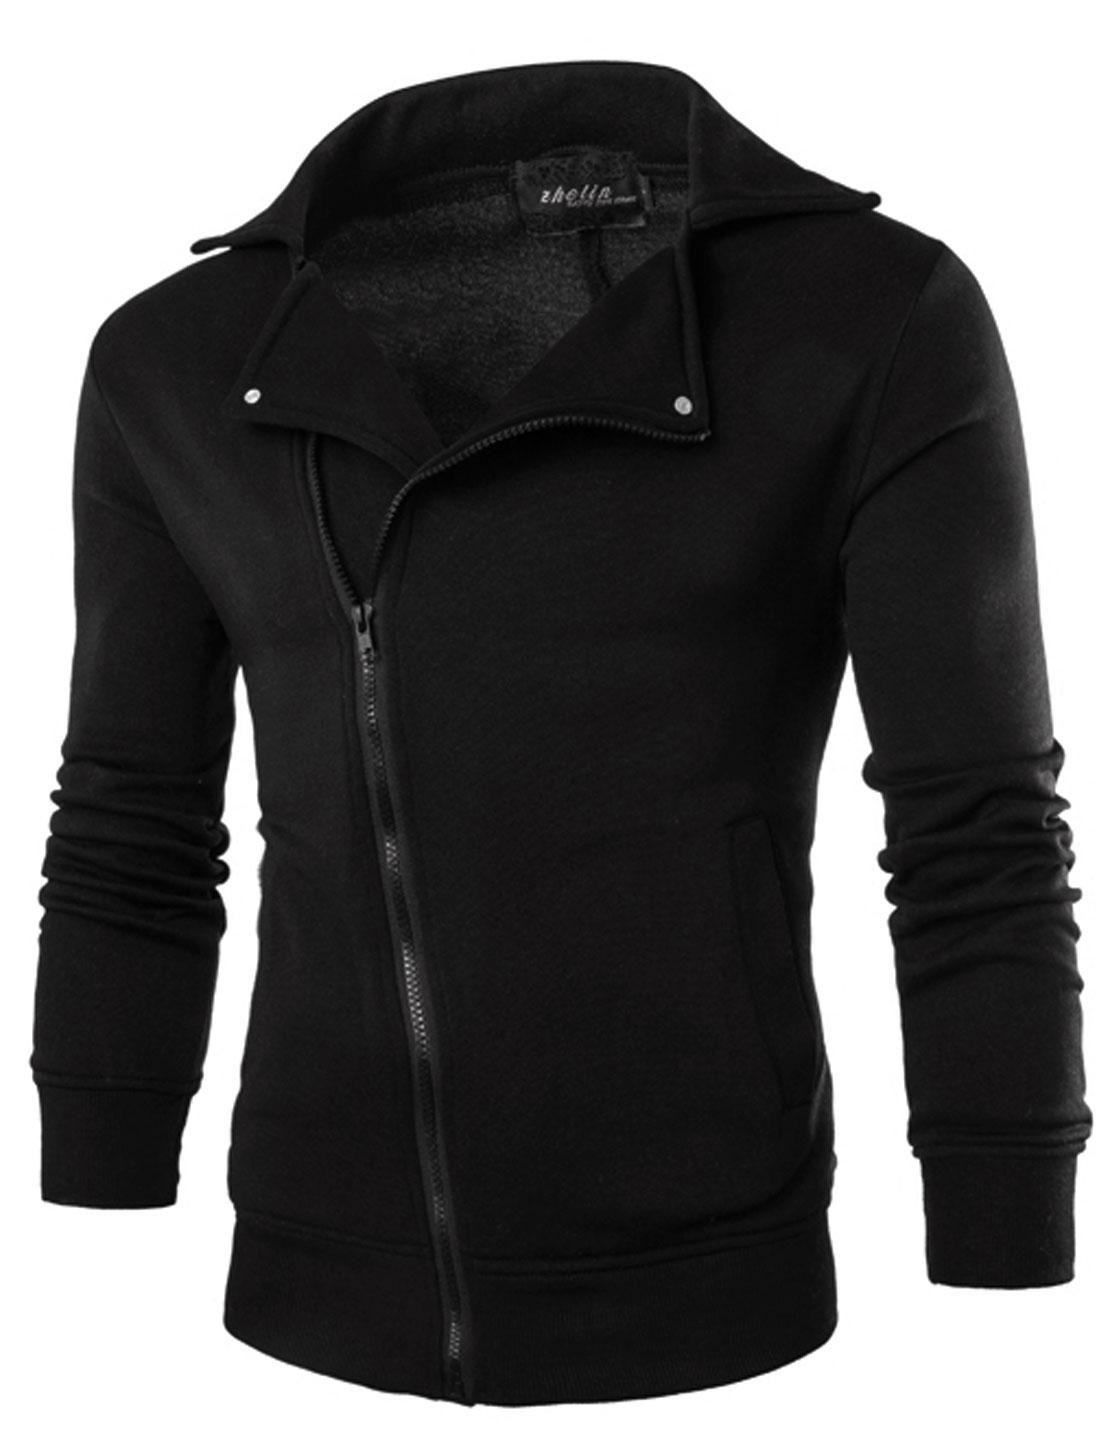 Men Inclined Zipper Turn Down Collar Side Pockets Jacket Black M